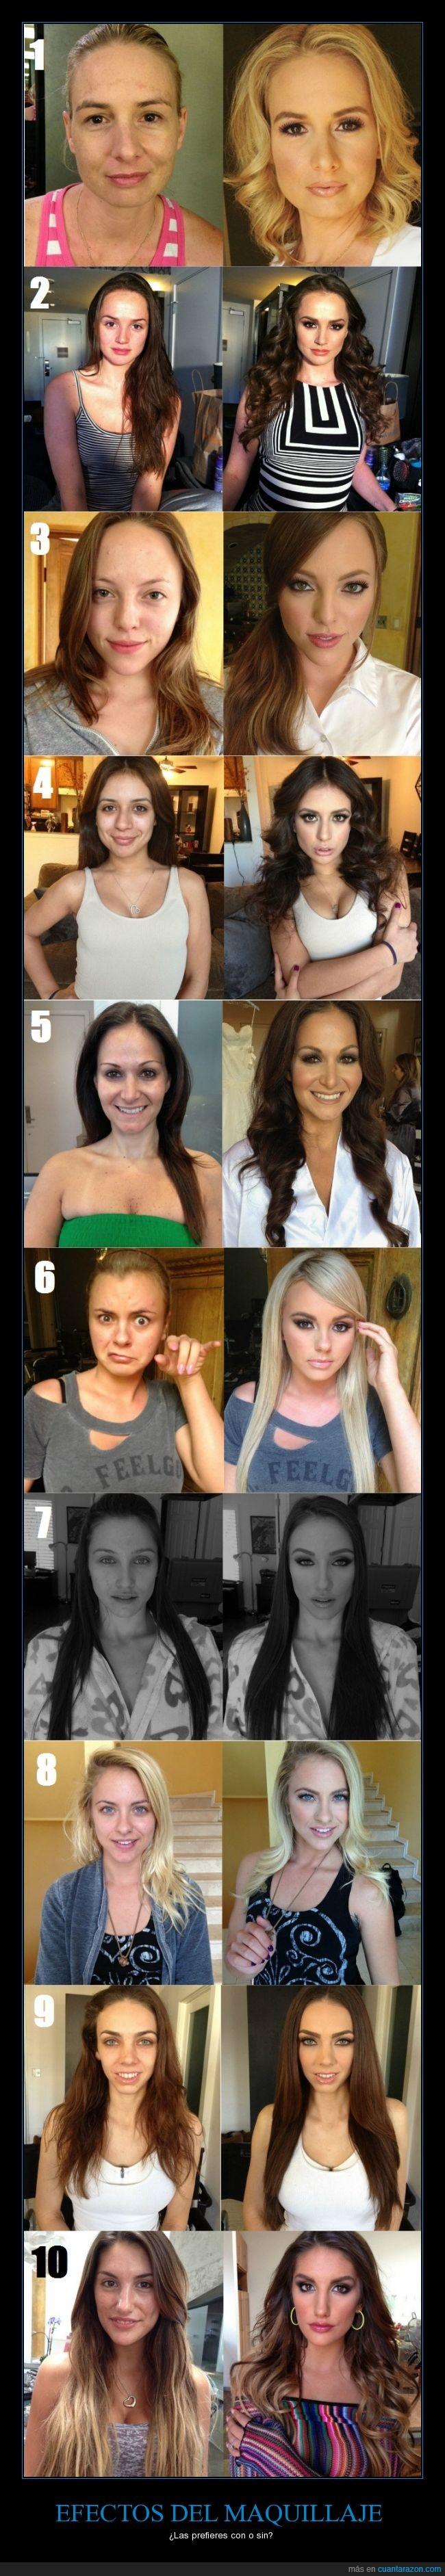 belleza,chicas,elegir,guapa,makeup,maquillaje,preferir